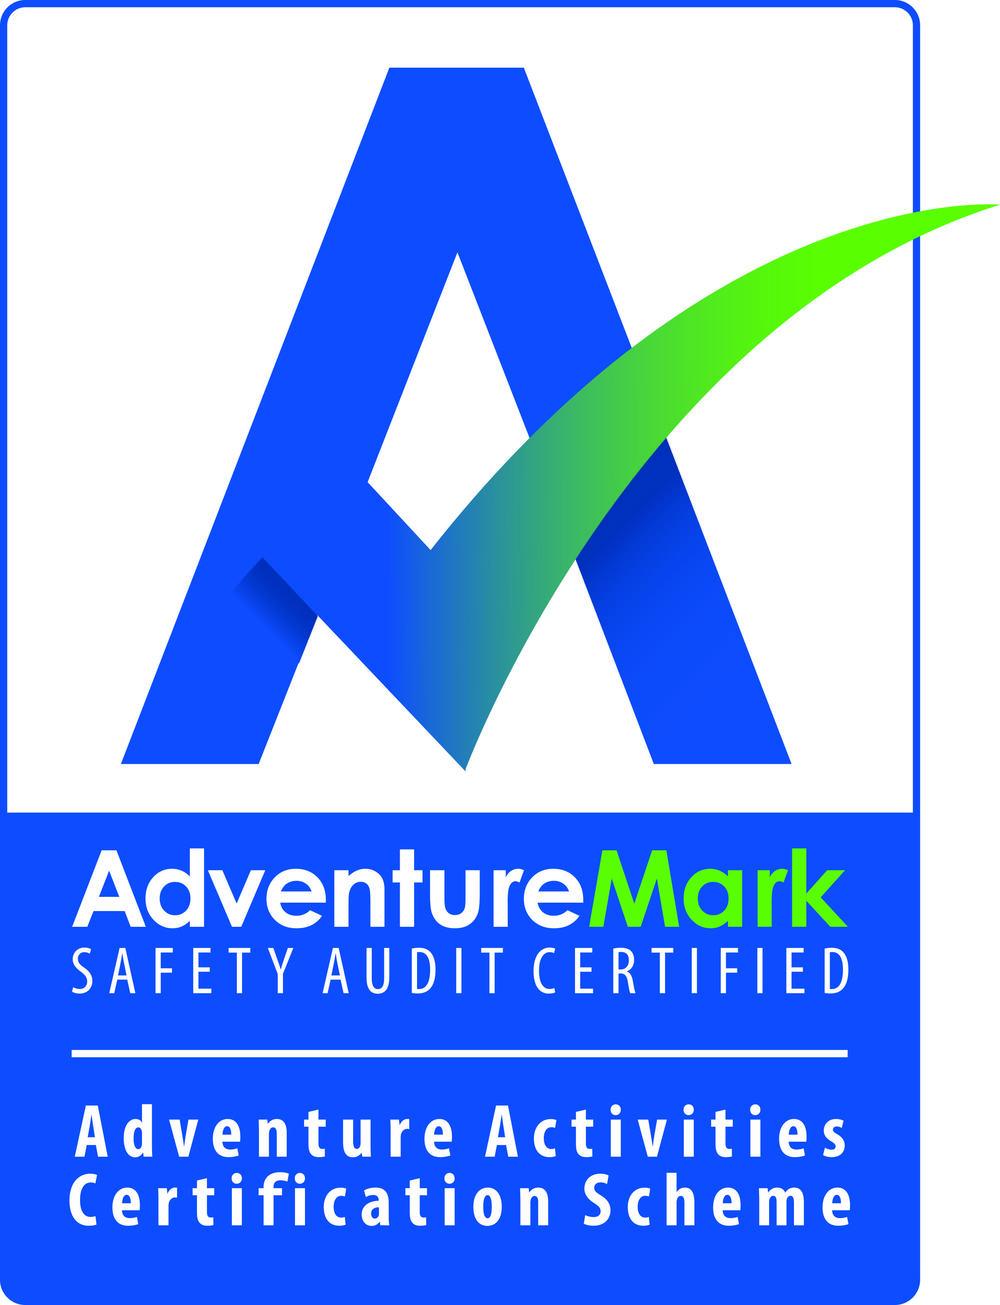 AdventureMark Symbol.jpg